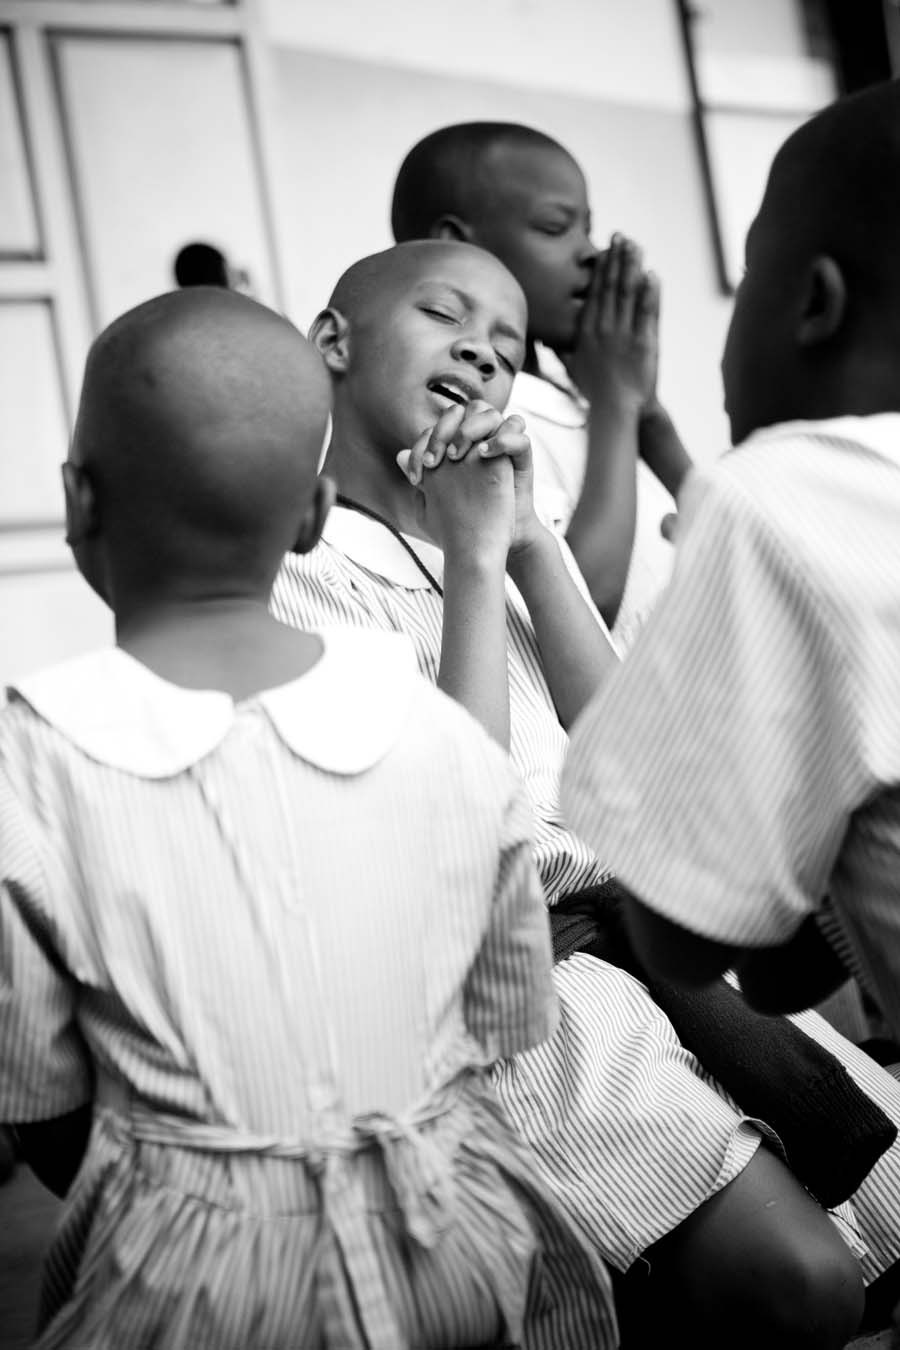 jessicadavisphotography.com | Jessica Davis Photography | Portrait Work in Uganda| Travel Photographer | World Event Photographs 3 (9).jpg